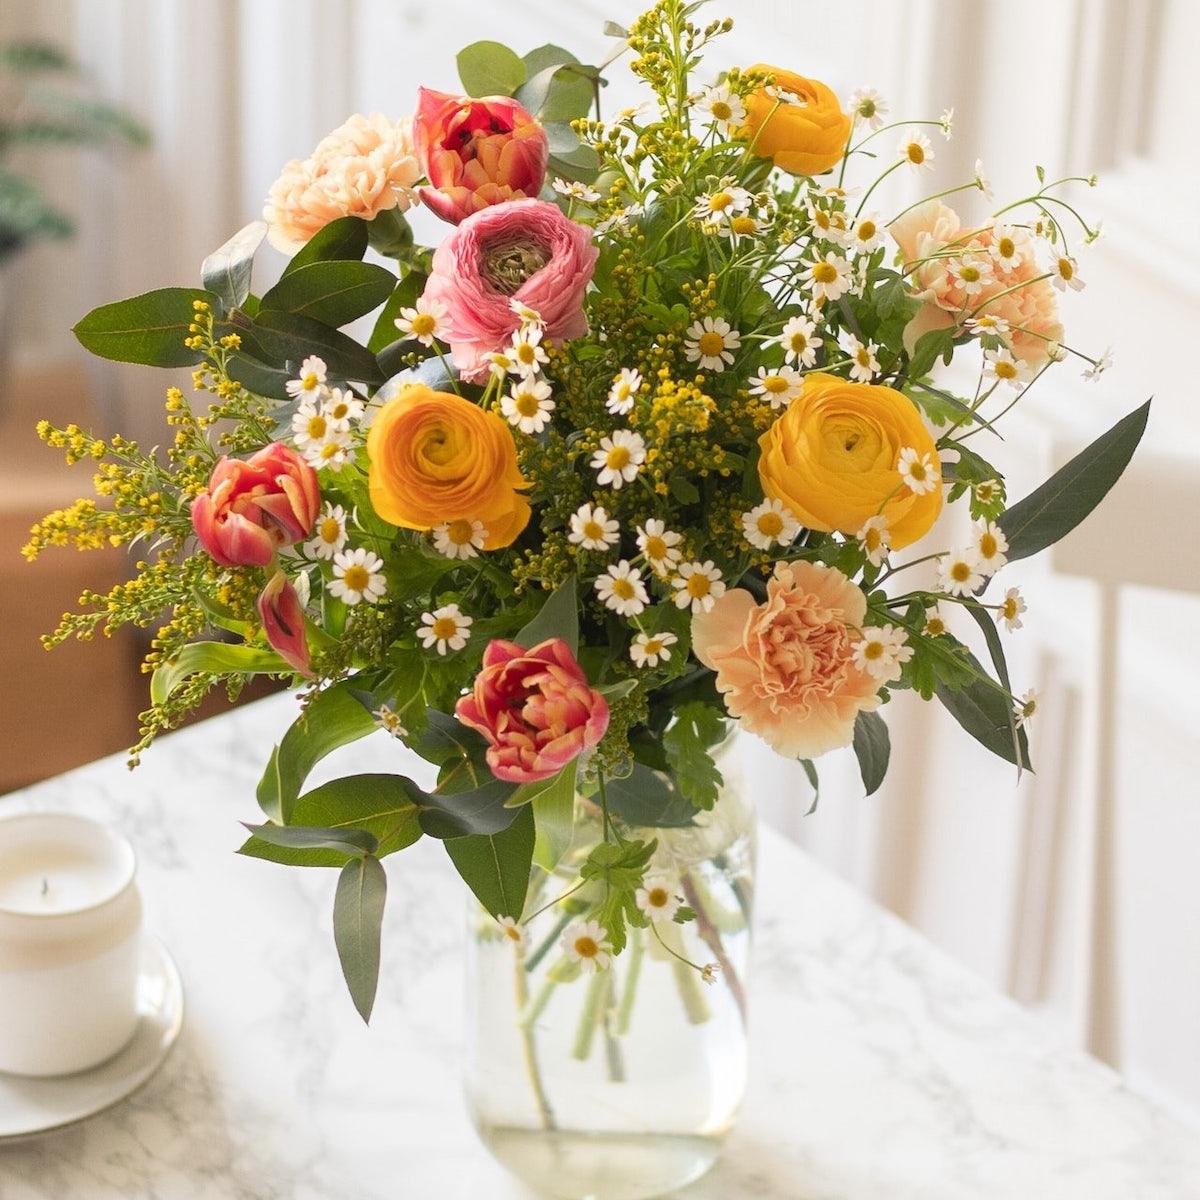 bouquet tulipe renoncule oeillet eucalyptus jaune rose